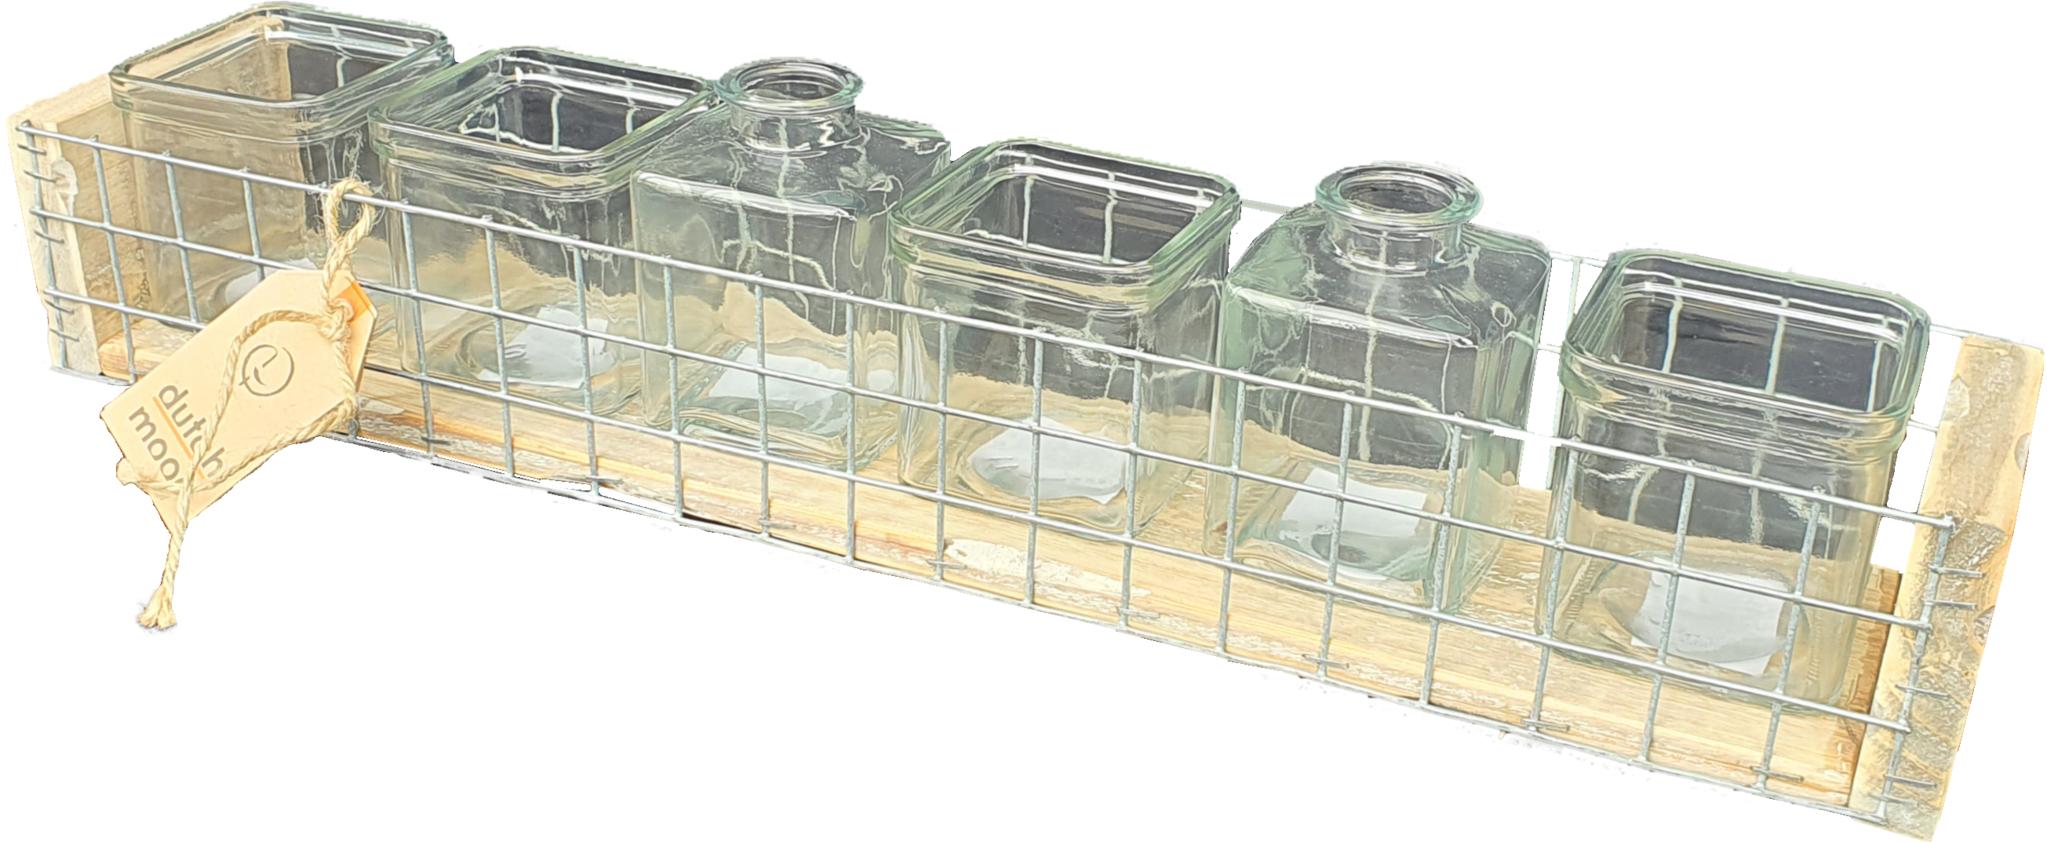 trayold dutchglass bask SQ6-1